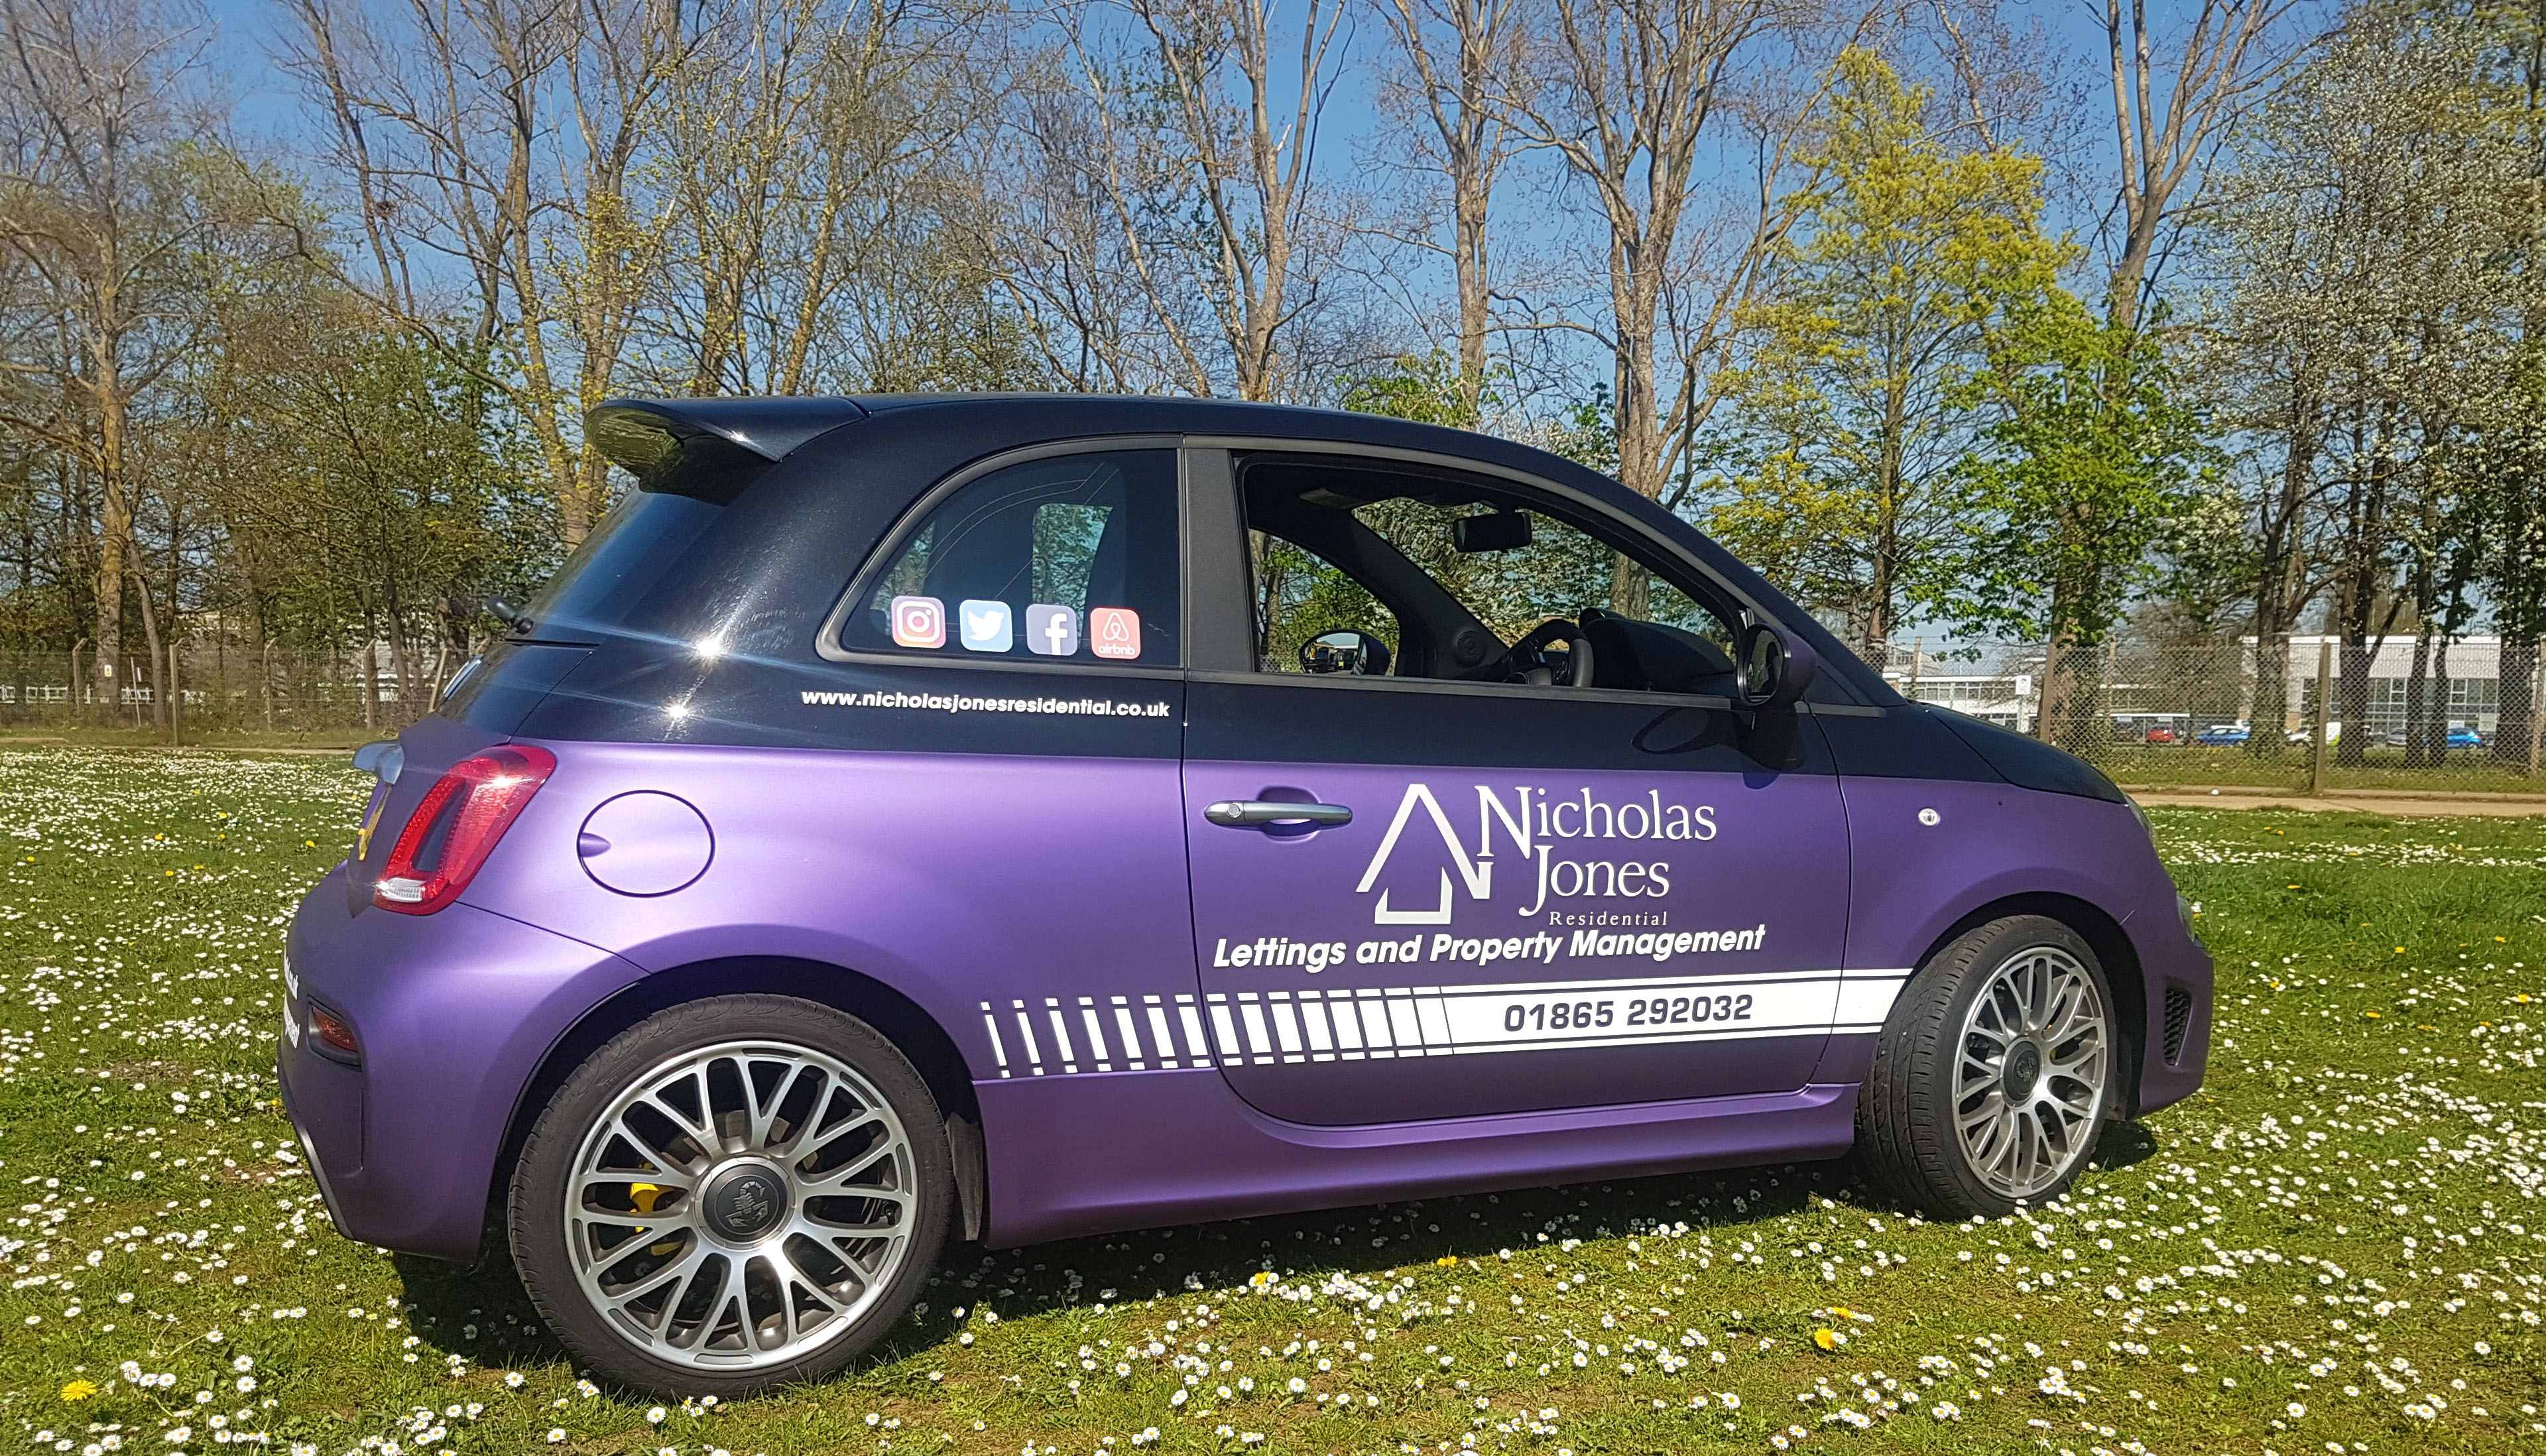 9de484ded0 Partial vinyl car wrap for Nicholas Jones Residential estate agents in  Oxford. Giving their company car a fresh new look.